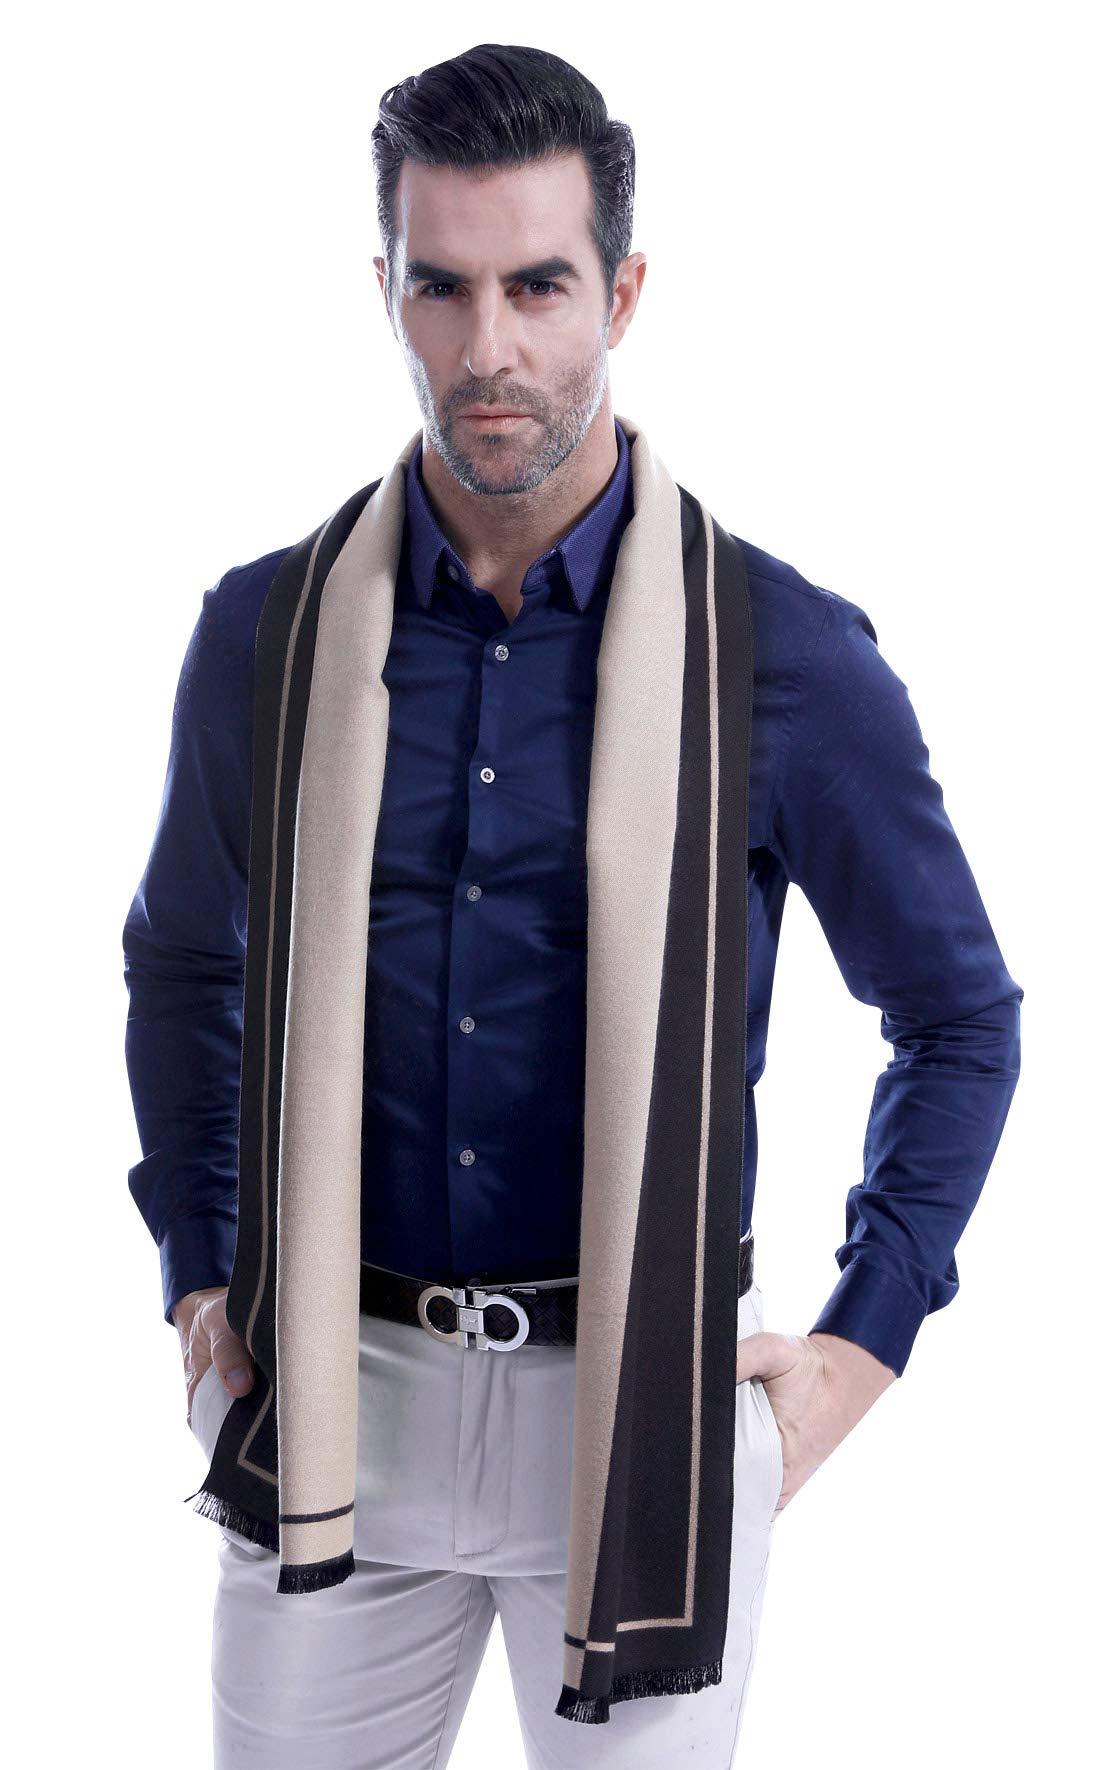 Classic Men's Business Warm Scarf Super Soft Cashmere & Wool Blend Scarf Long Winter Warm Neckerchief Beige & Black